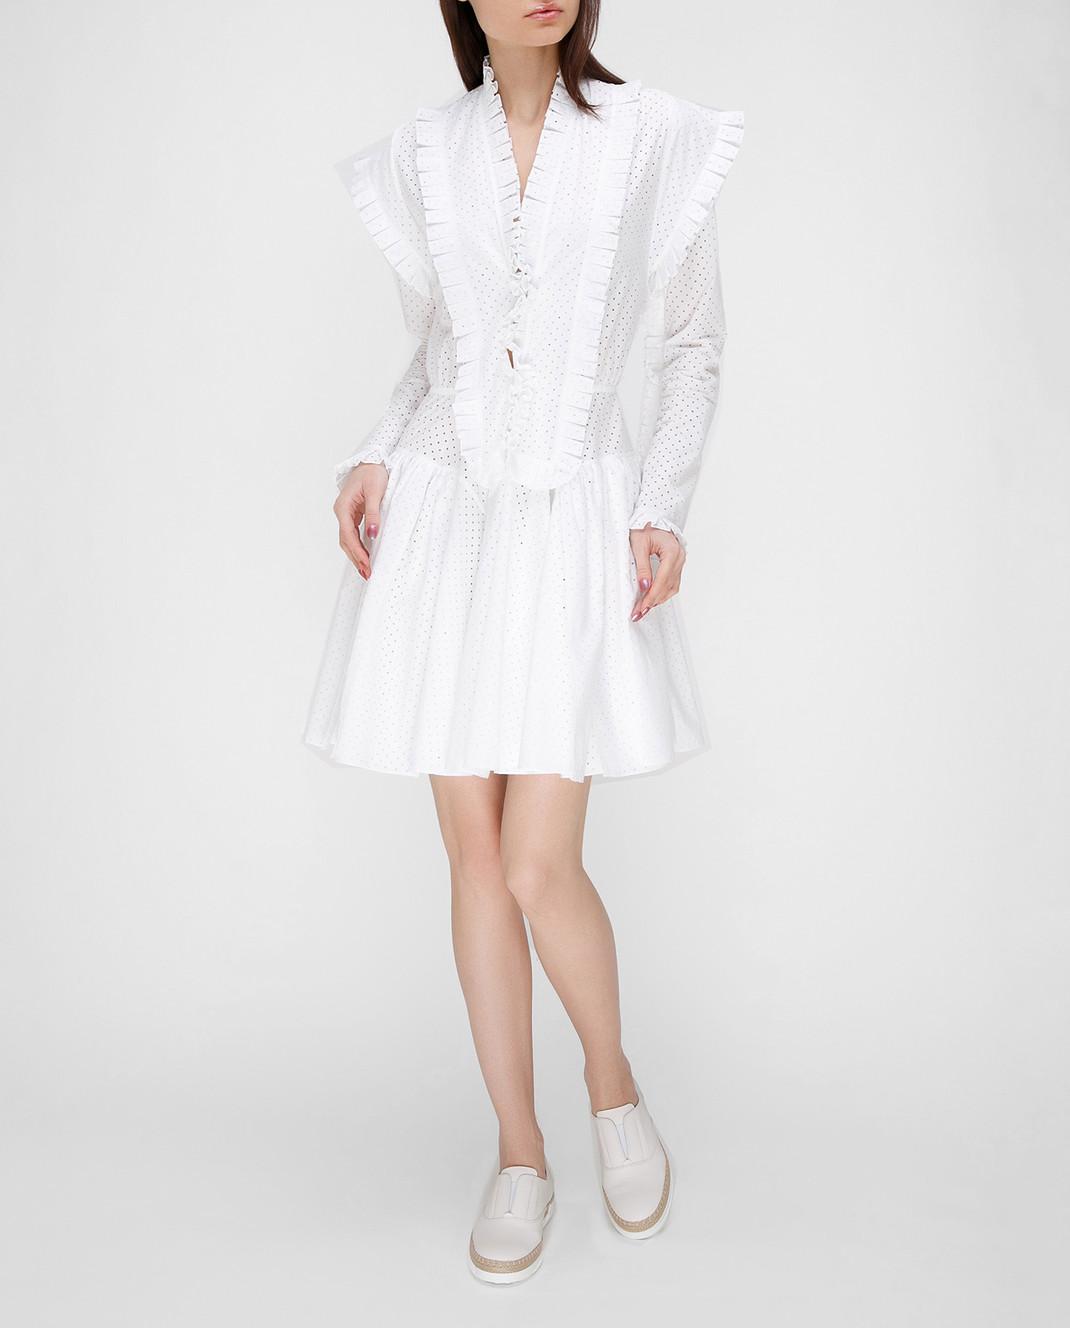 Azzedine Alaia Белое платье 7S9R054RTL48 изображение 2